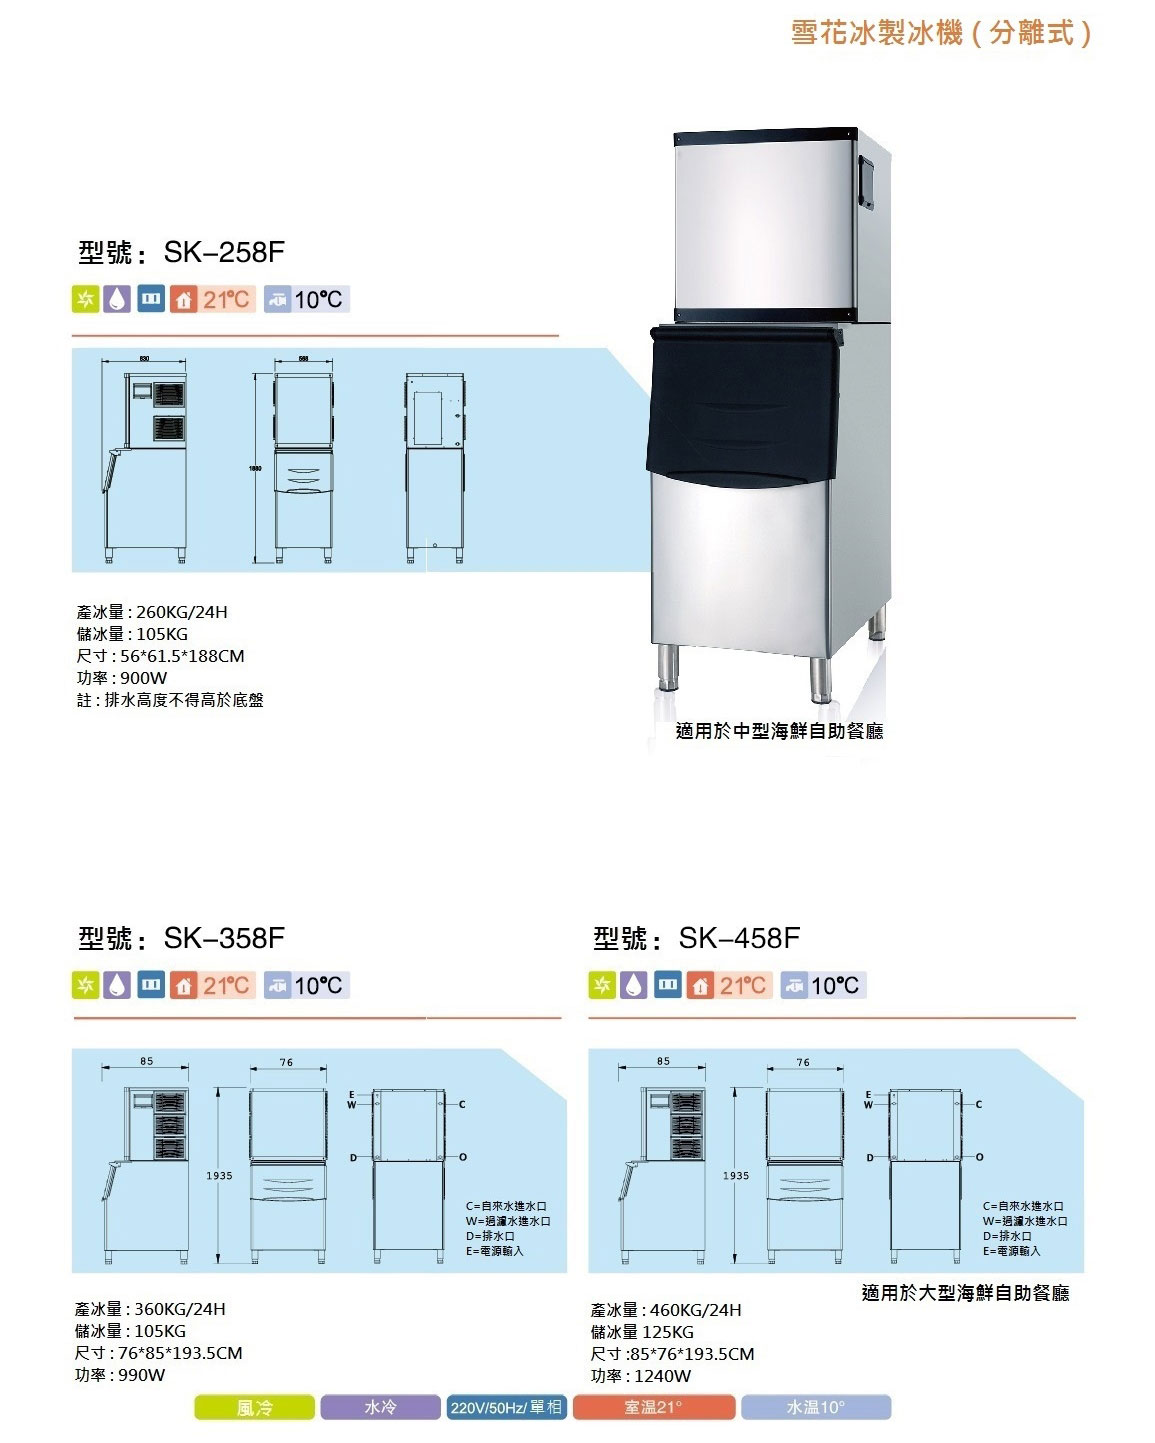 【SK-358F】碎冰製冰機-適用海鮮自助餐廳